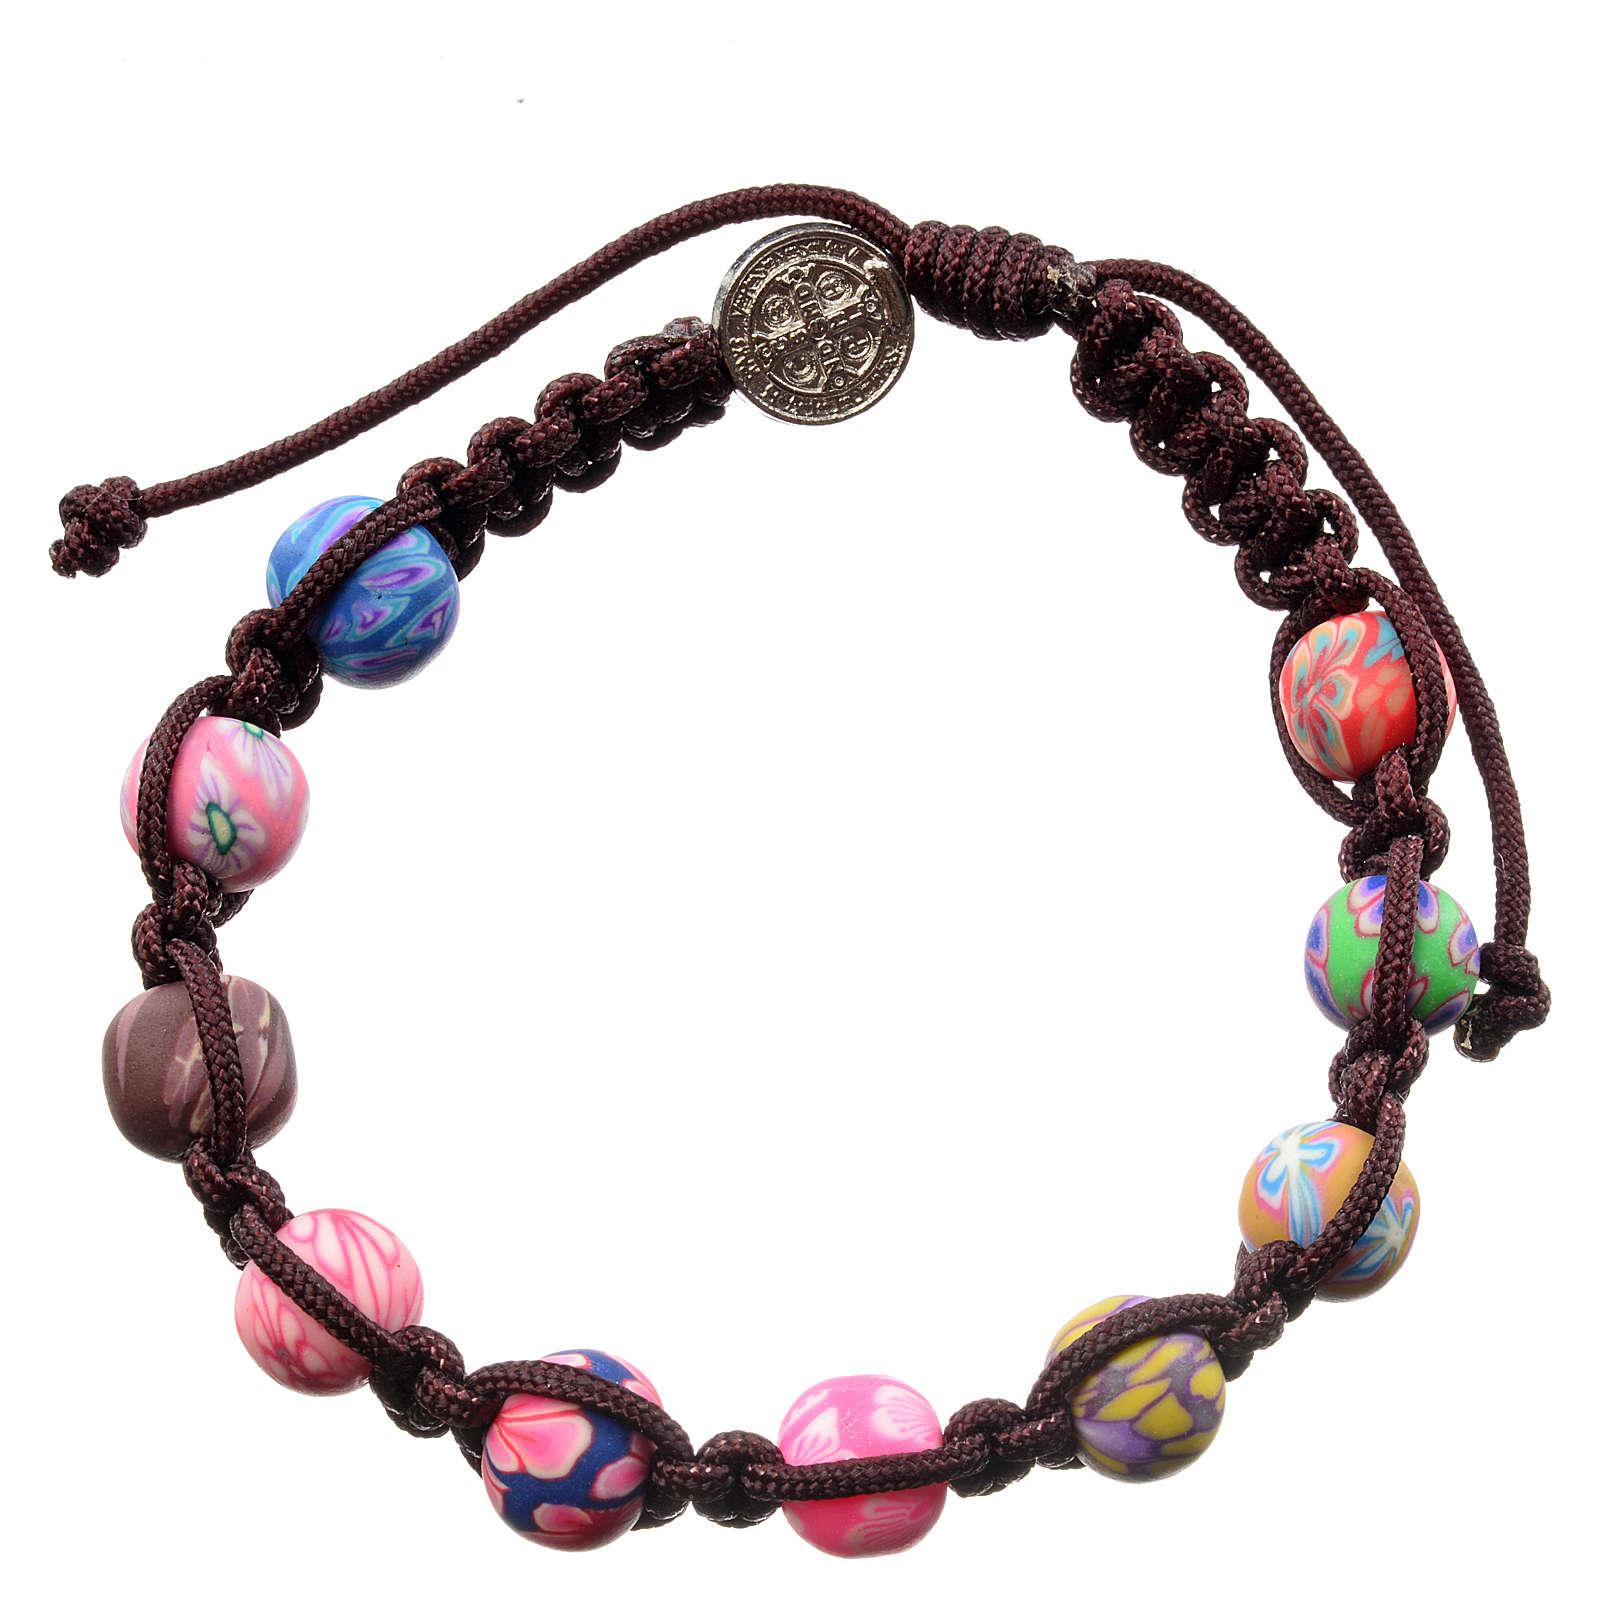 Bracelet Medjugorje fimo corde marron foncé 4